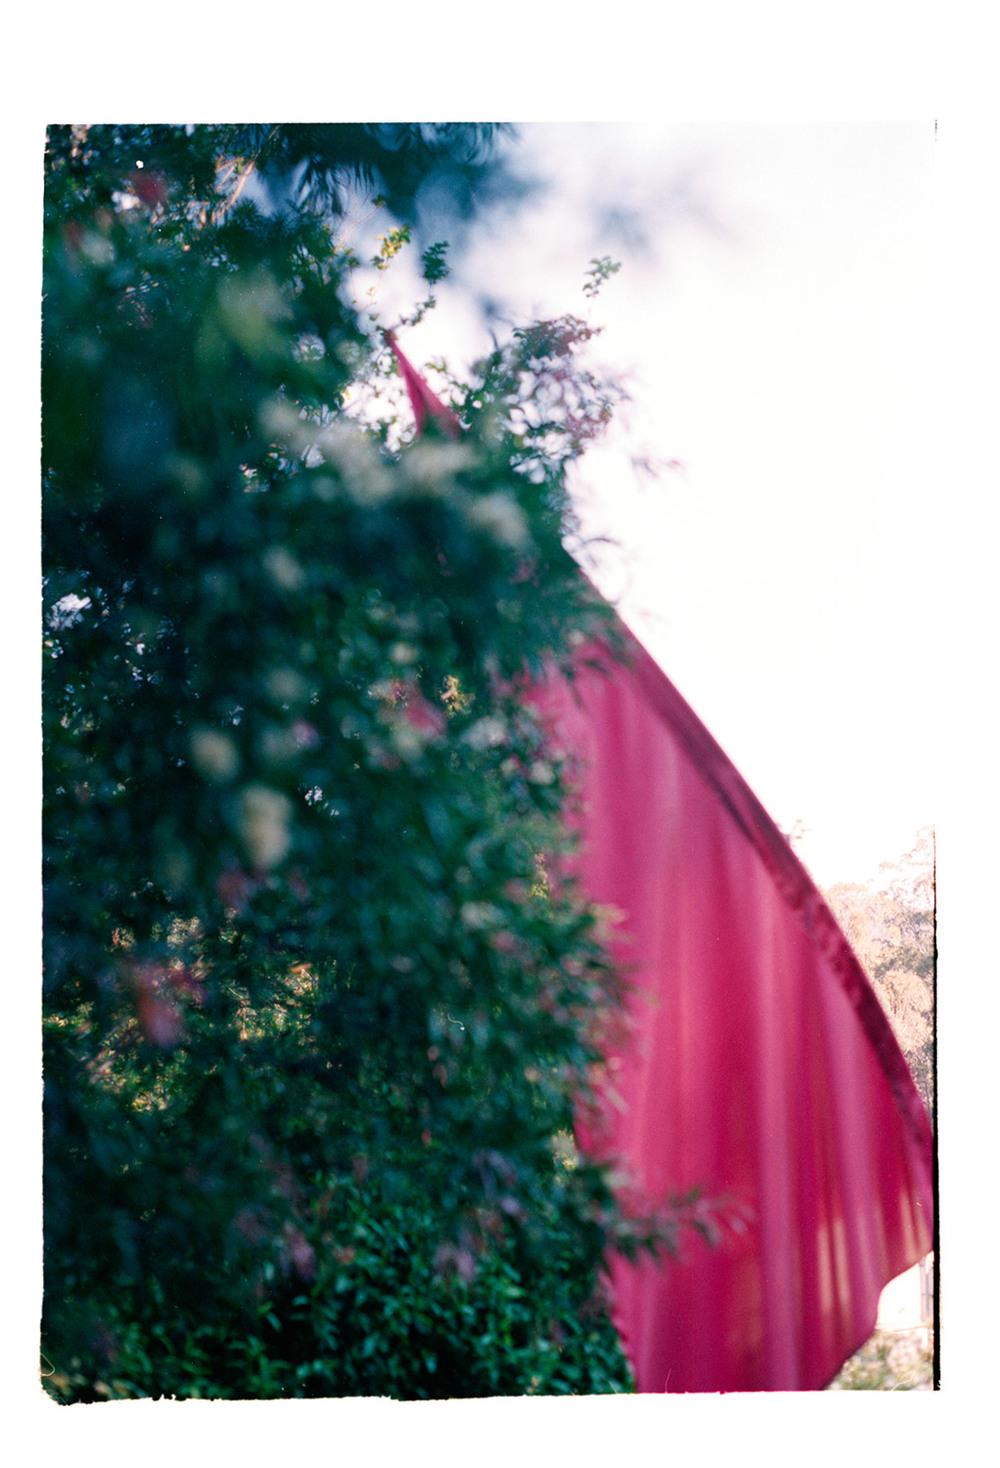 melaniejaynetaylor-eyecollective-2013-14.jpg